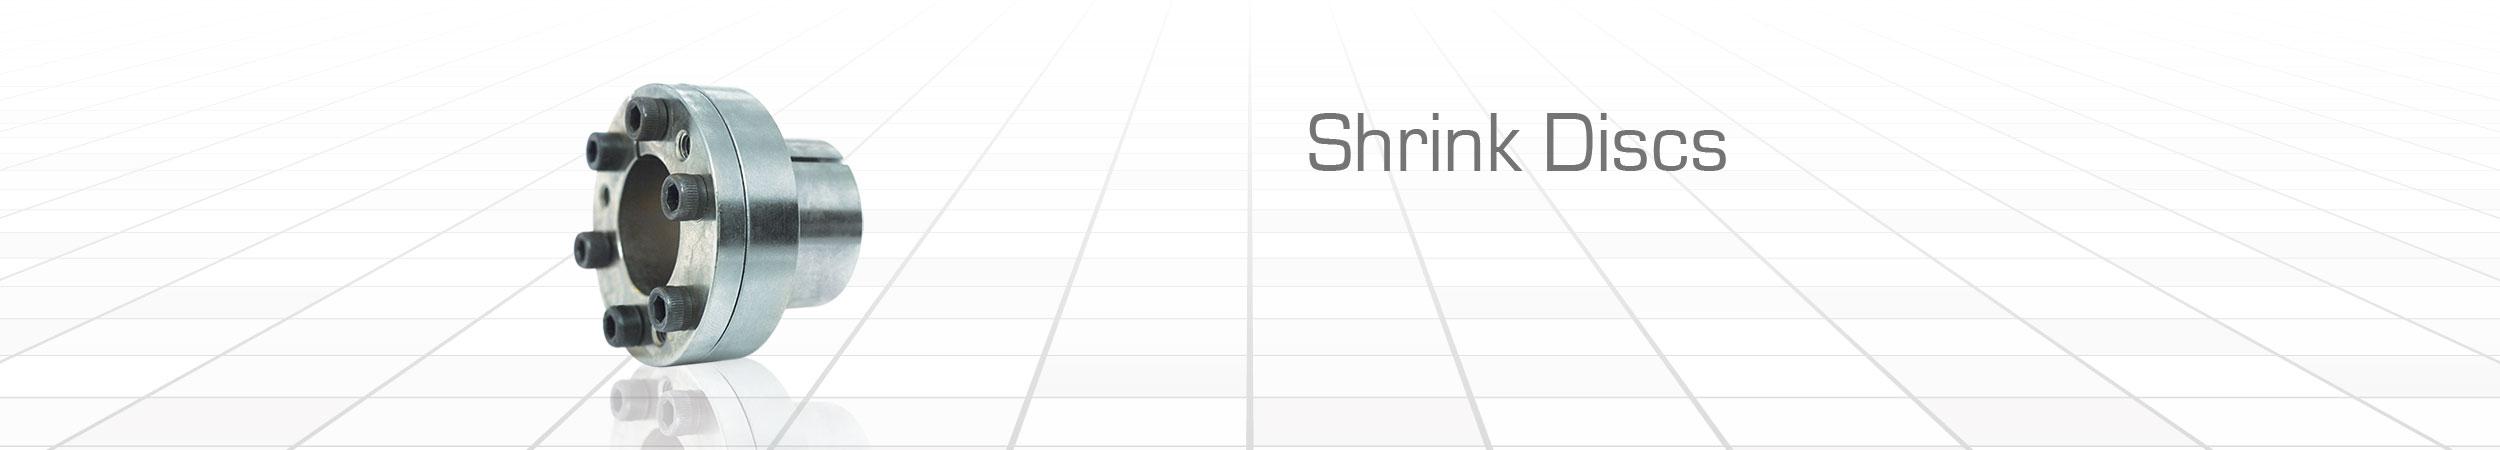 Shrink Discs